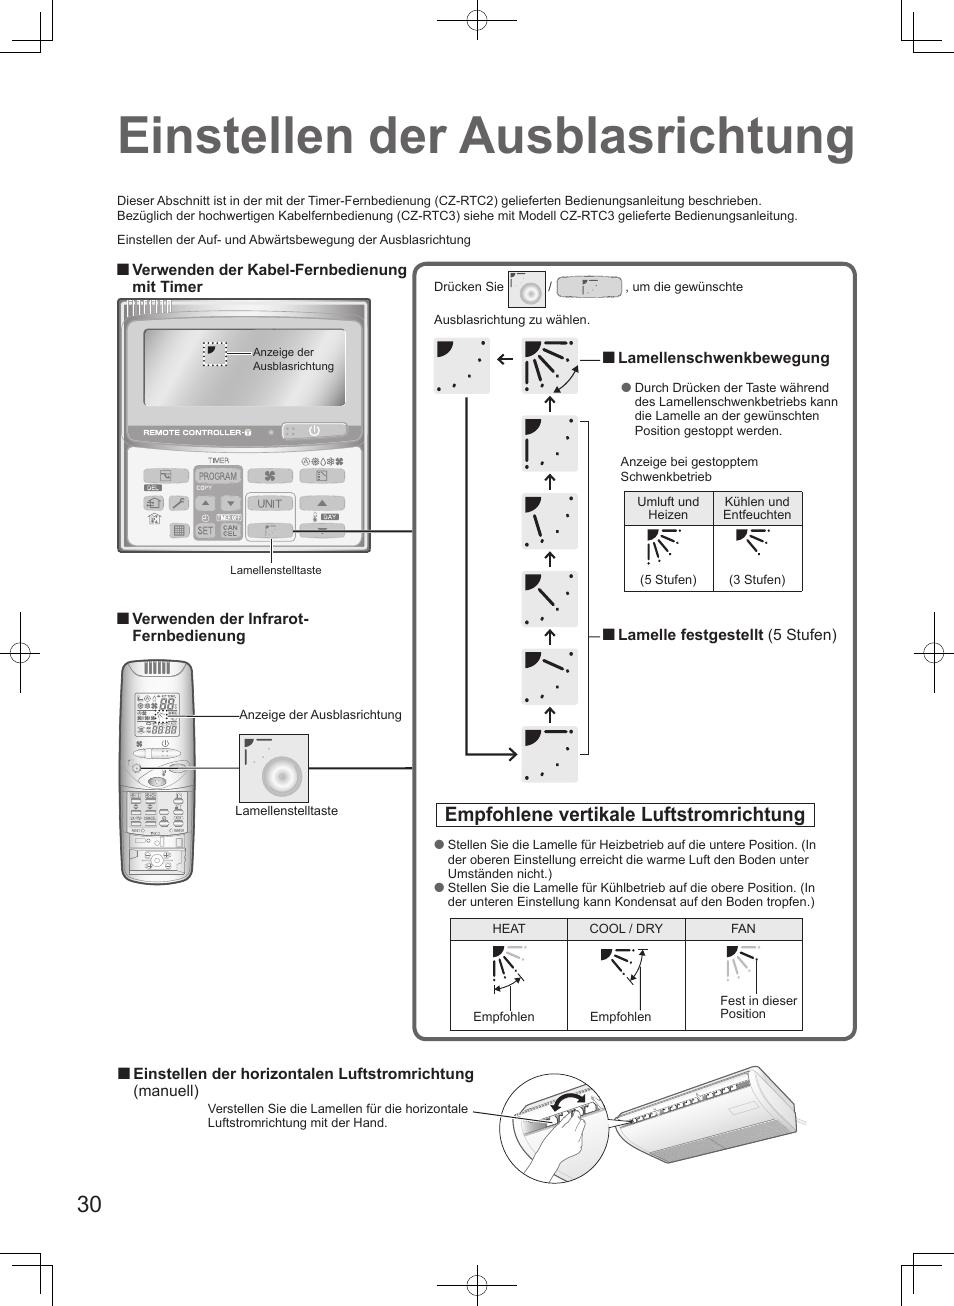 Einstellen der ausblasrichtung, Empfohlene vertikale luftstromrichtung |  Panasonic S106MF2E5A User Manual | Page 30 /